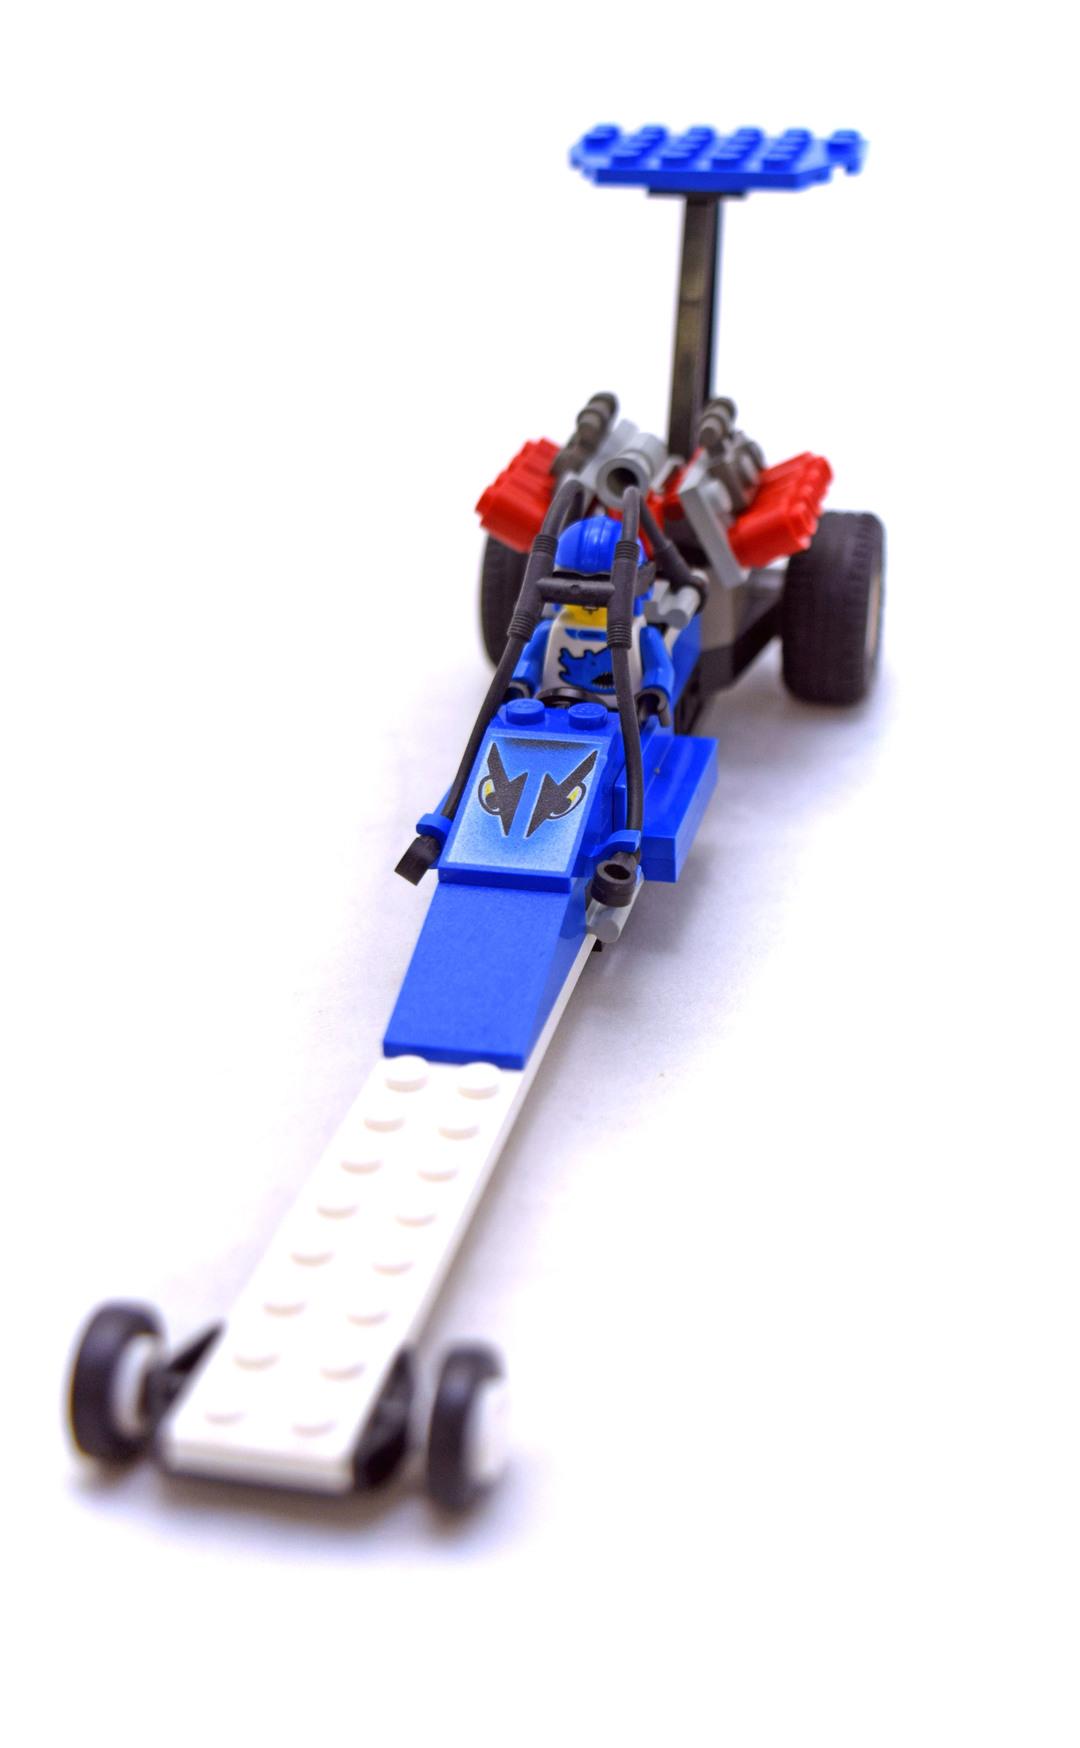 Lego Drag Racer Instructions